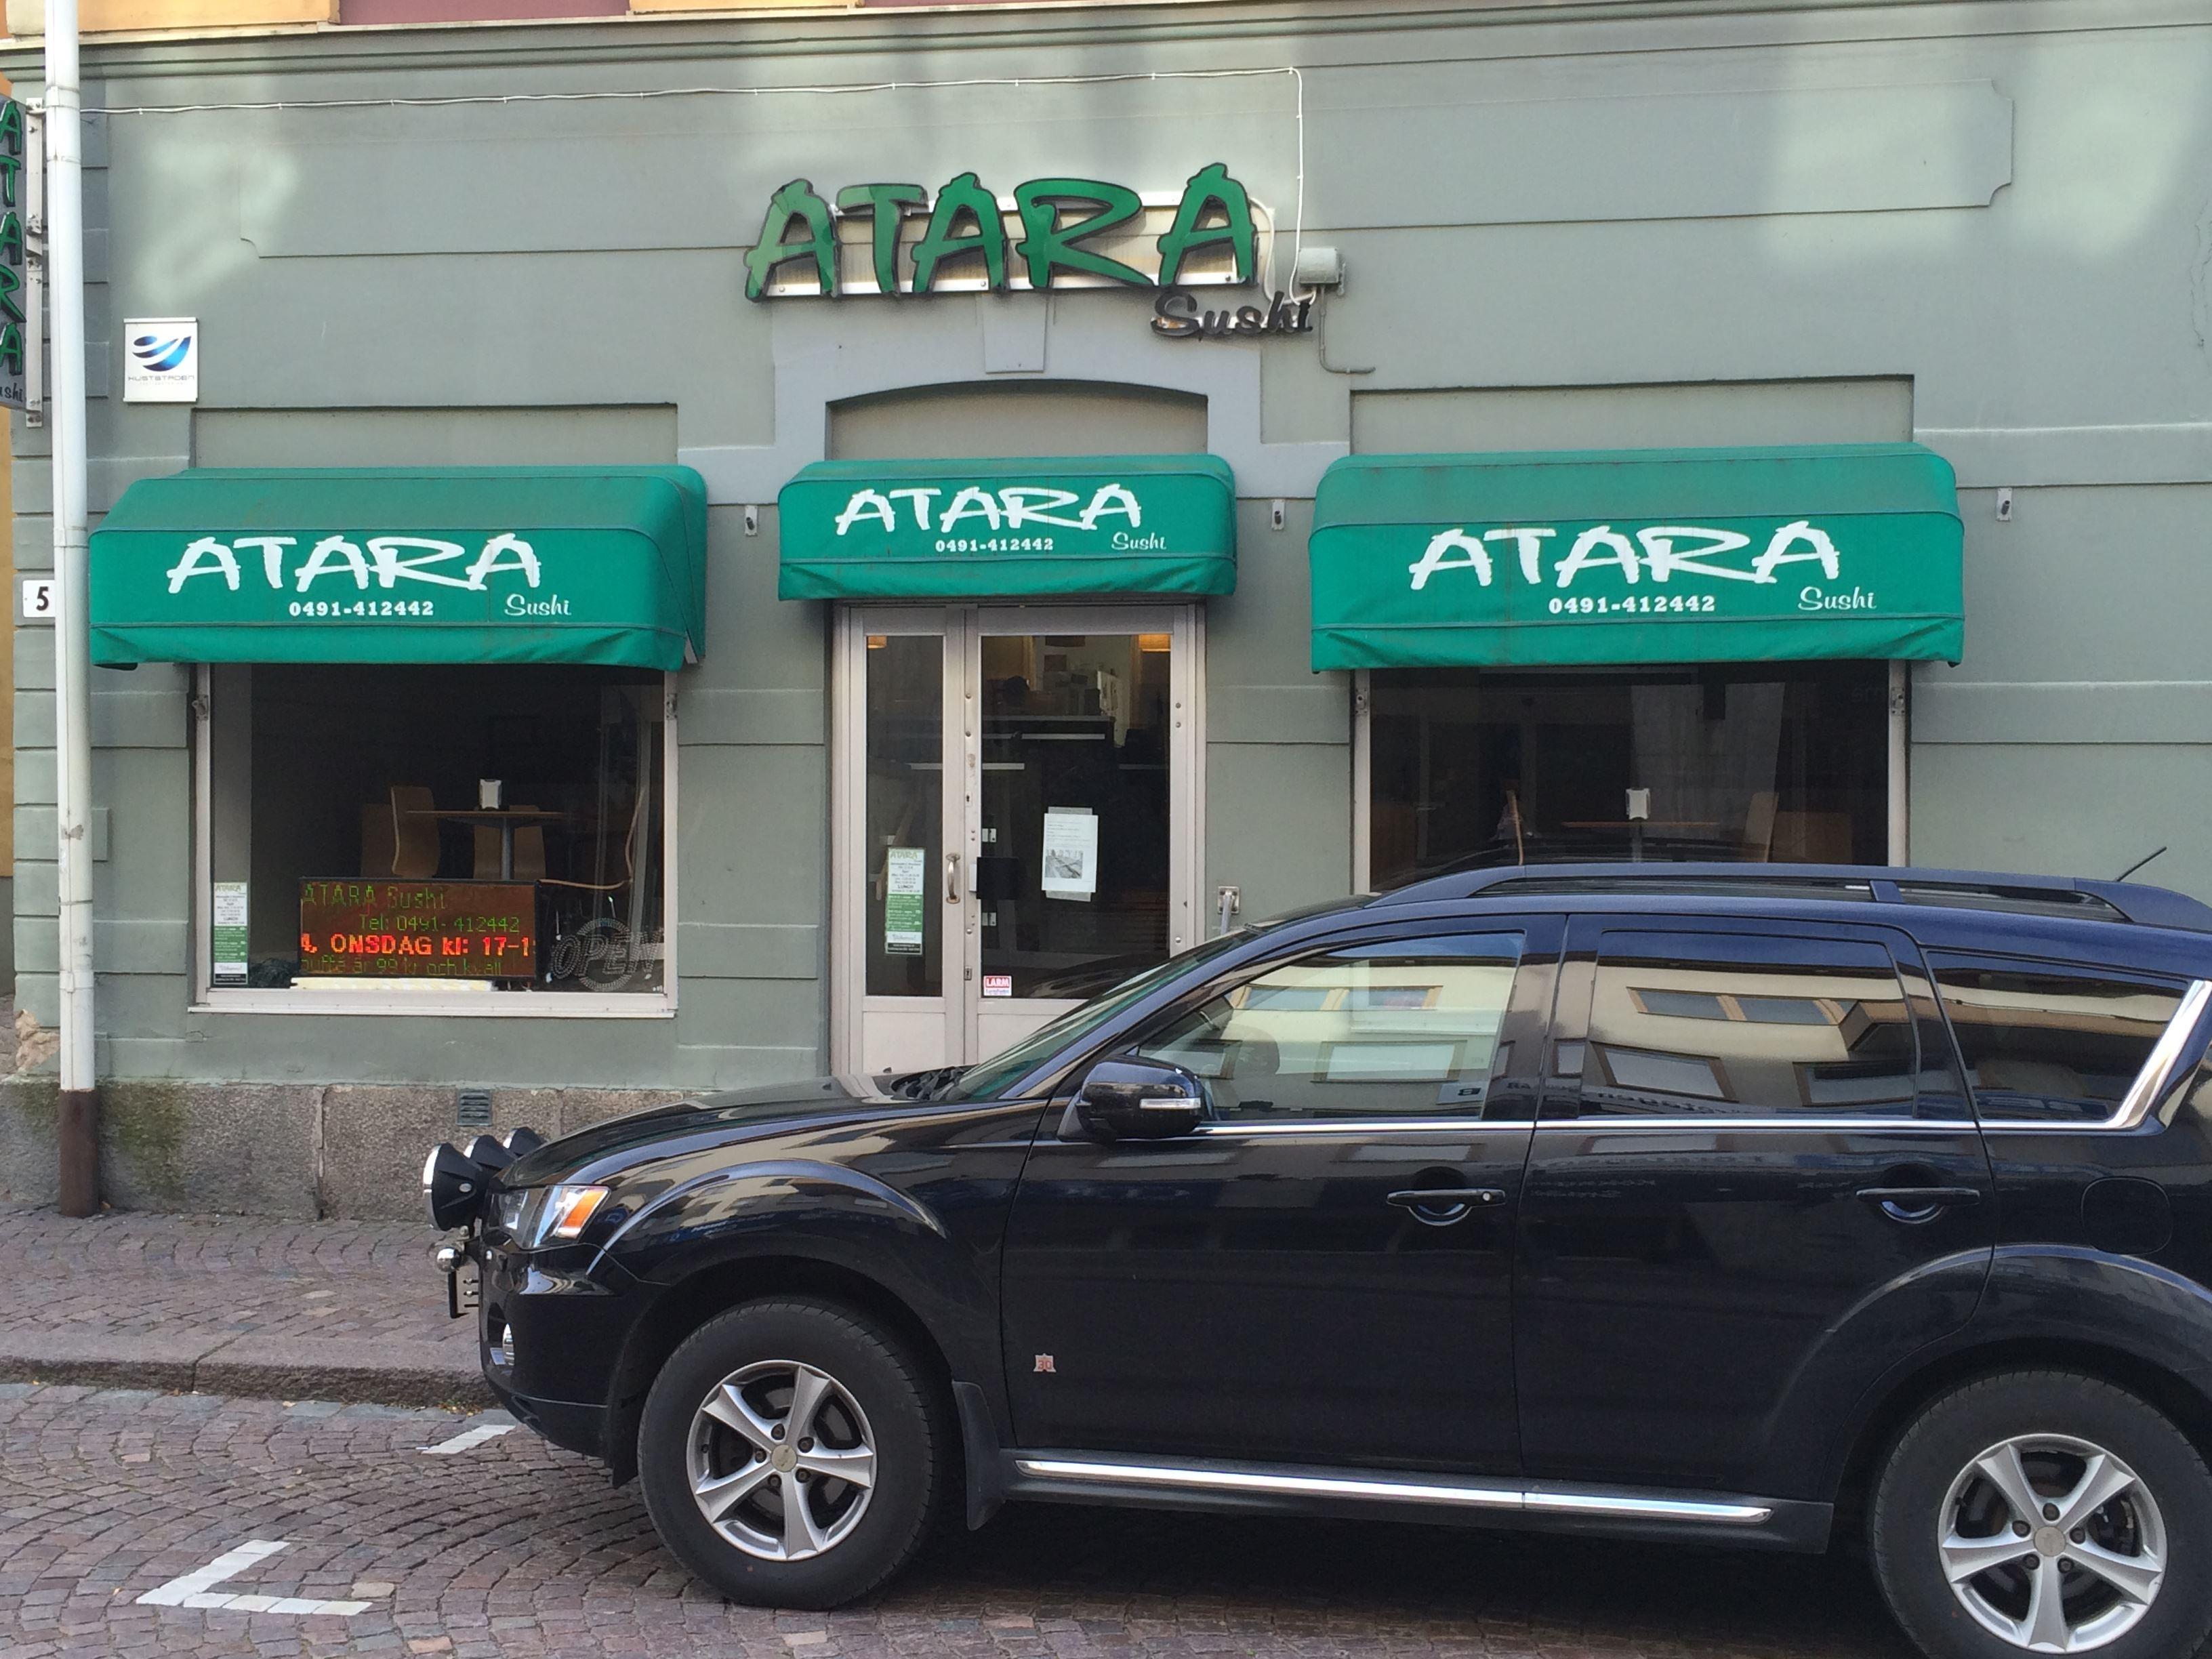 Atara Sushi